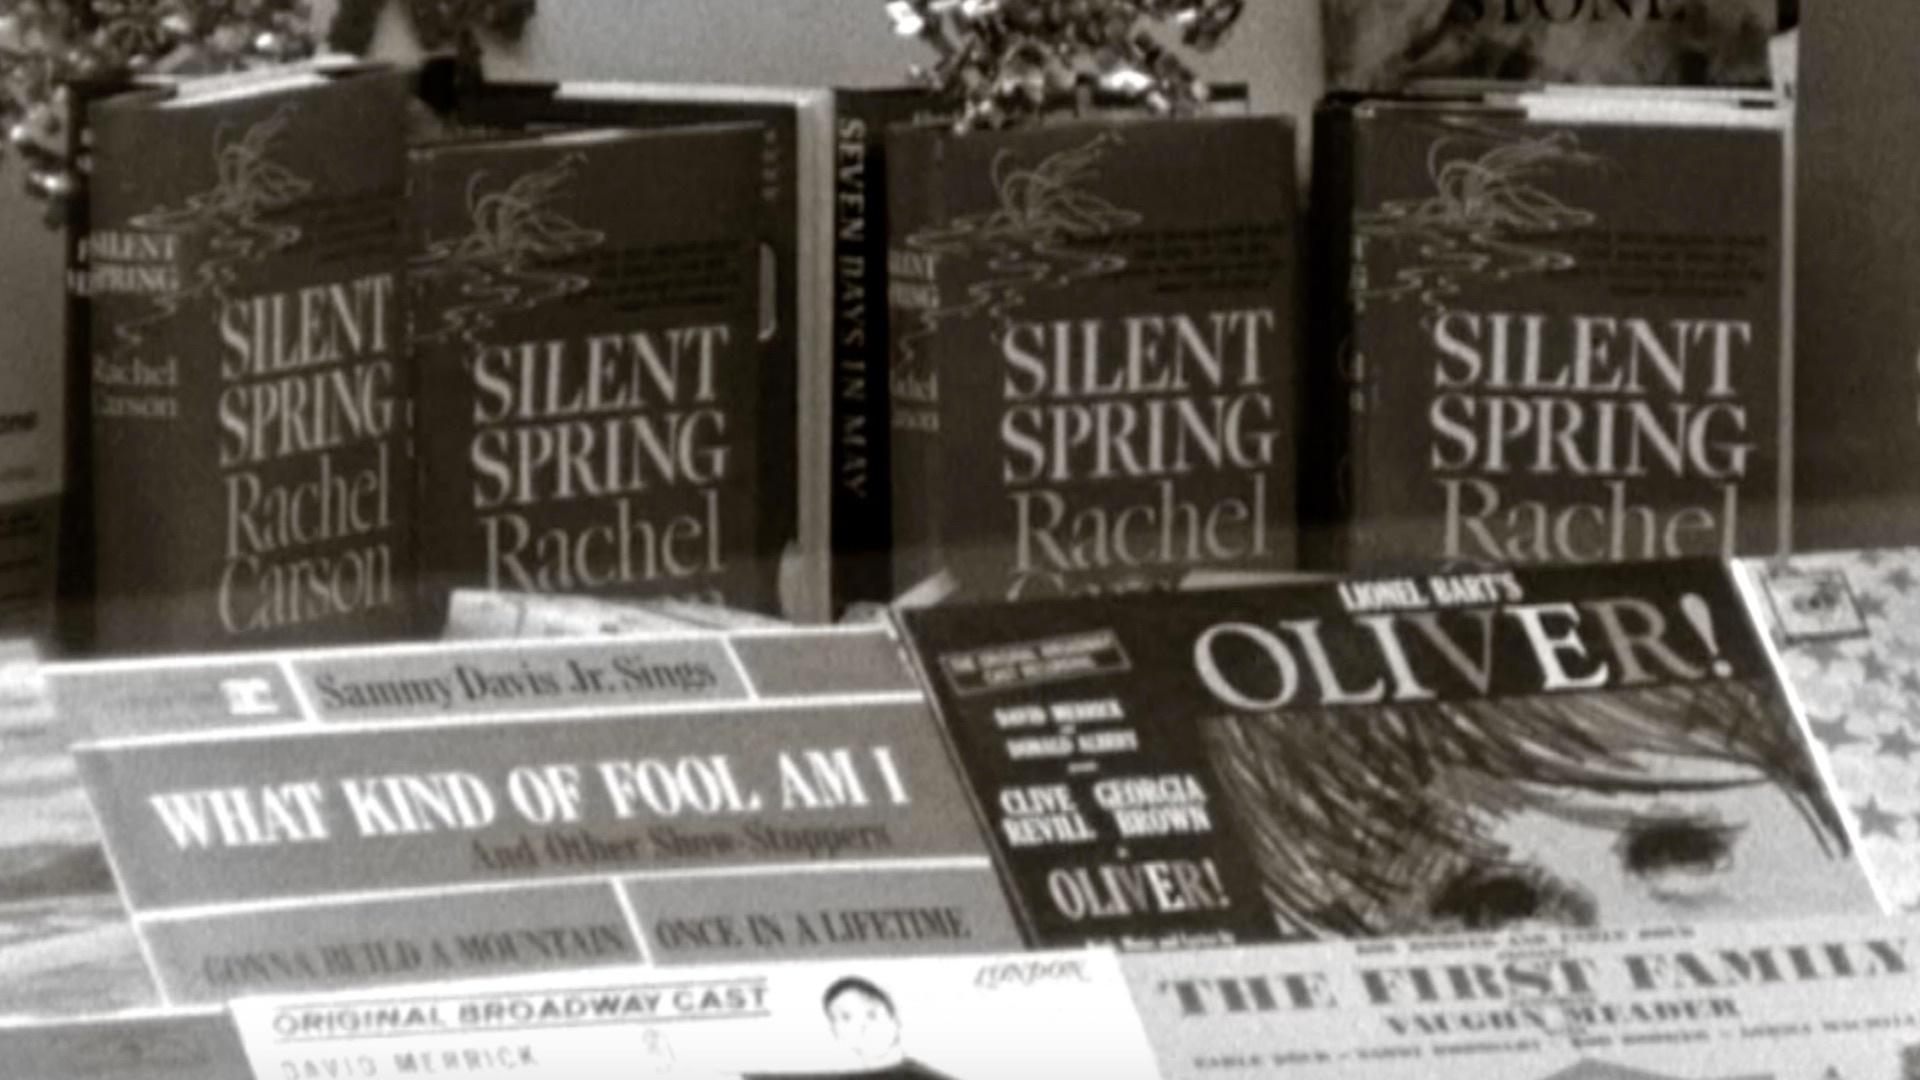 Rachel Carson, Chapter 1